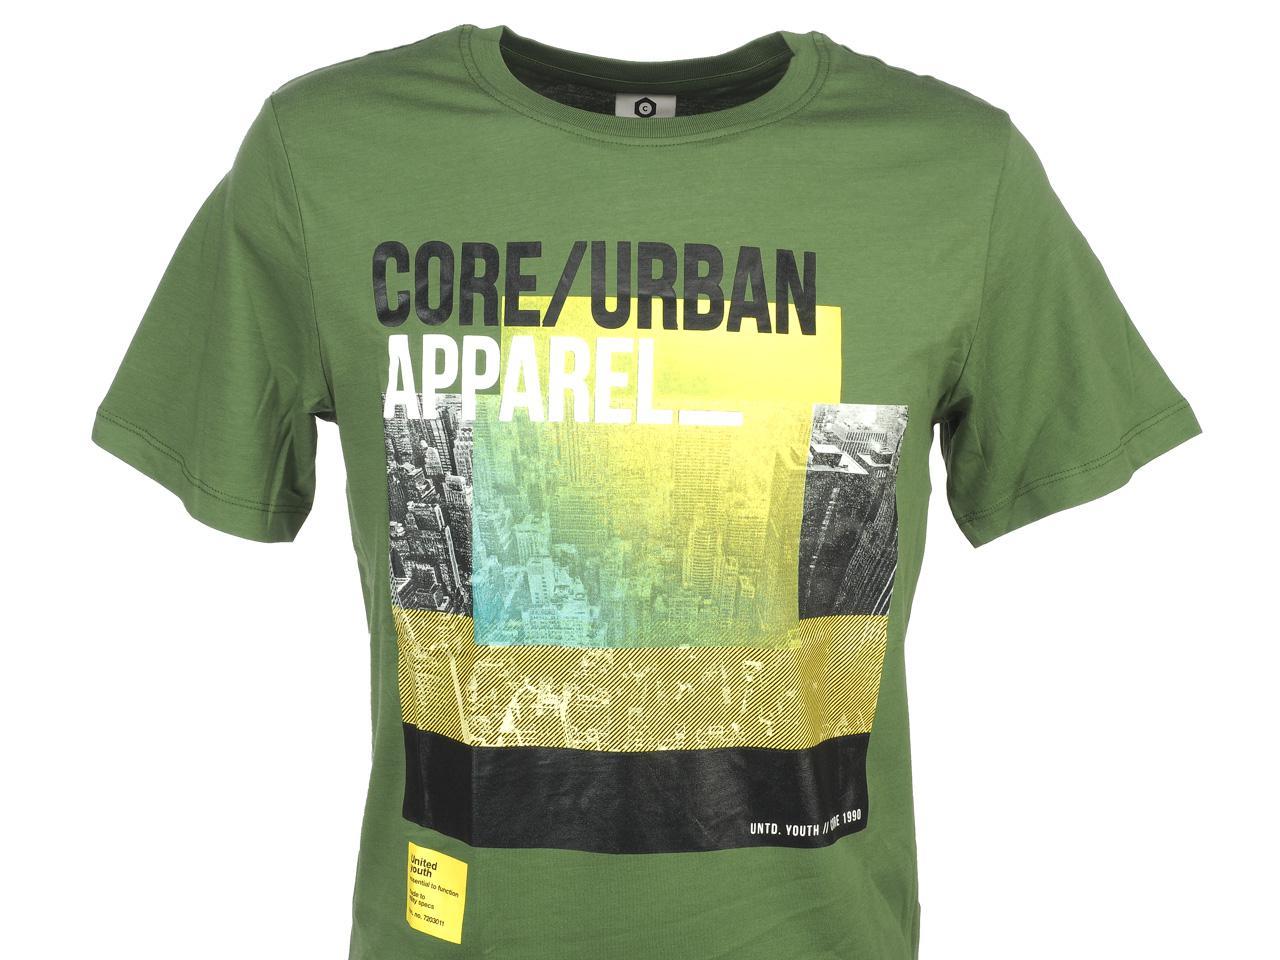 Short-Sleeve-T-Shirt-Jack-and-Jones-Dave-Vineyard-Green-Tee-44186-Does-Not thumbnail 2